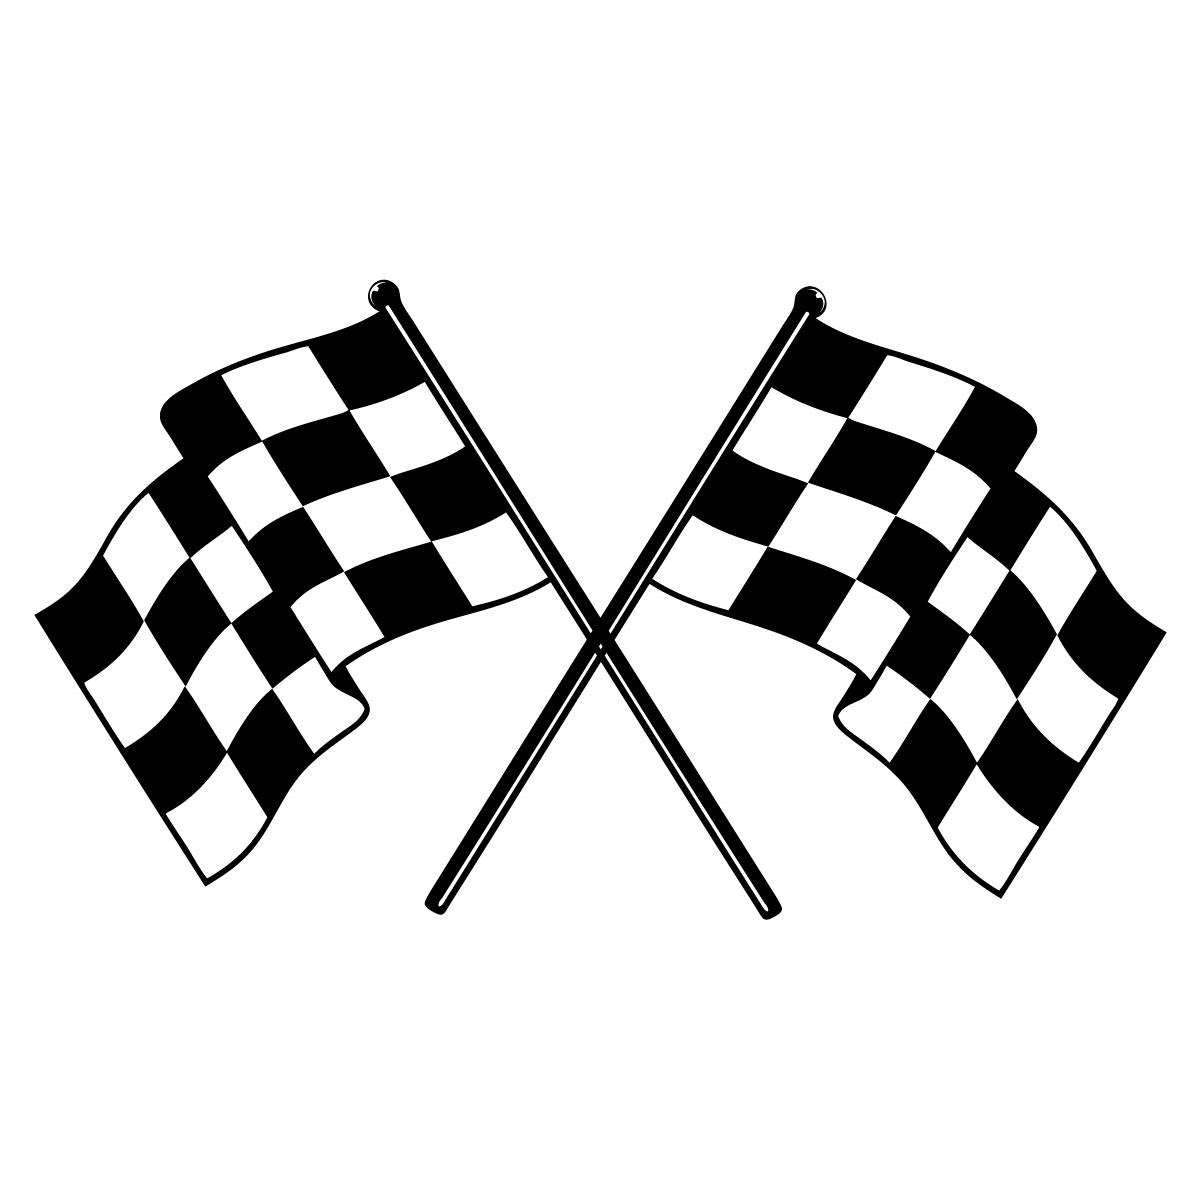 38 X 22 Checkered Race Flags Vinyl Bedroom Wall Art